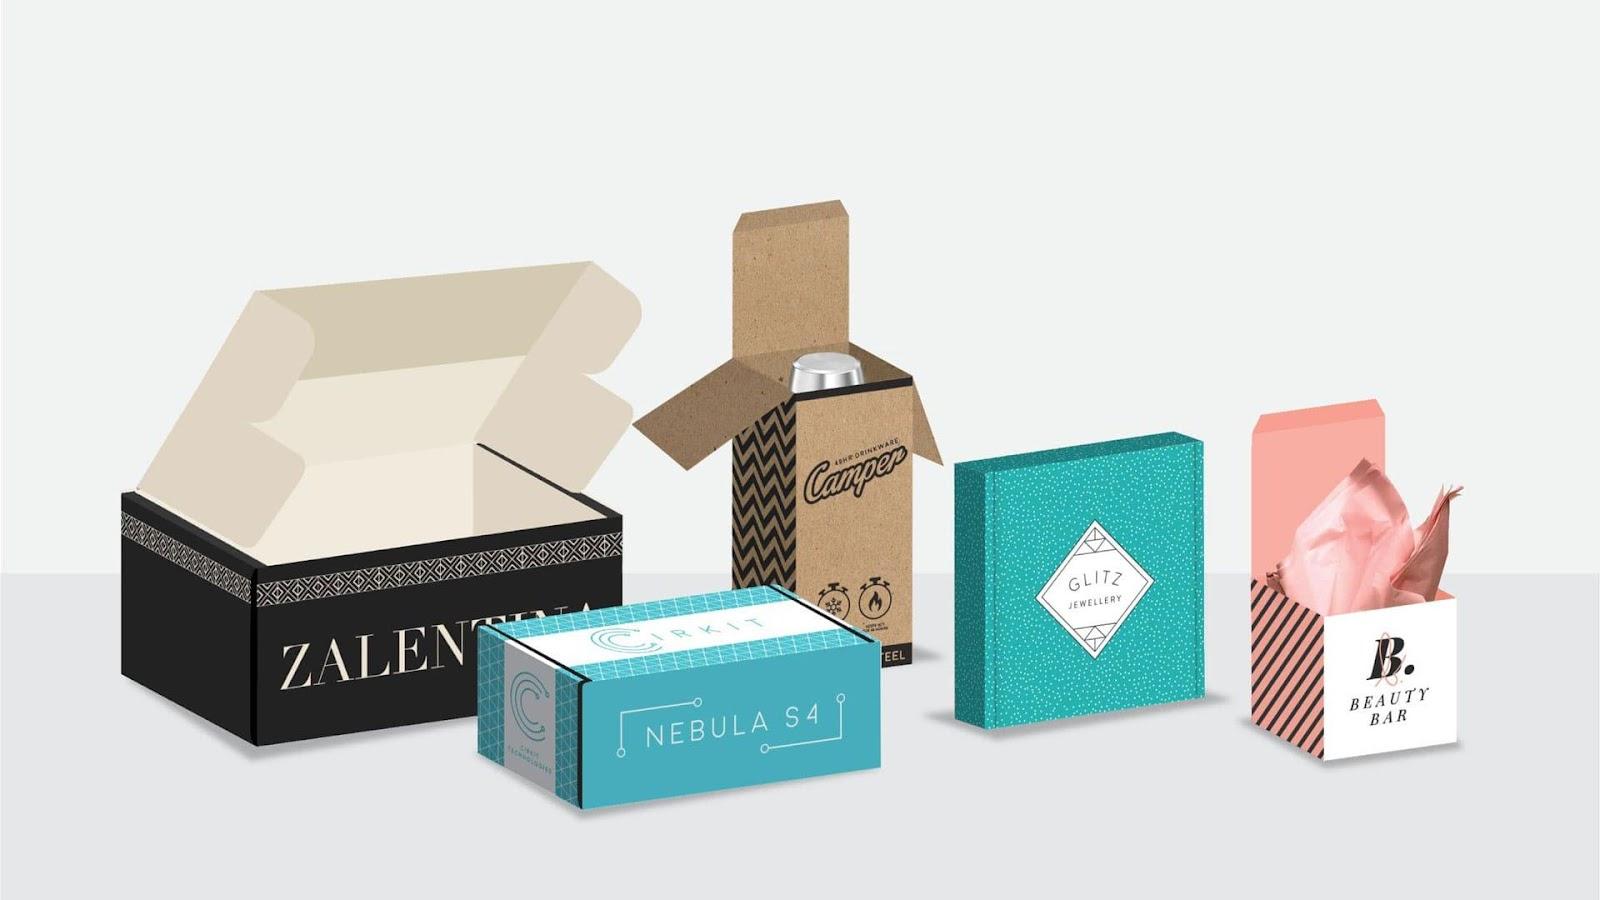 https://joecustomizedboxes.files.wordpress.com/2020/12/cosmetic-boxes-style.jpg